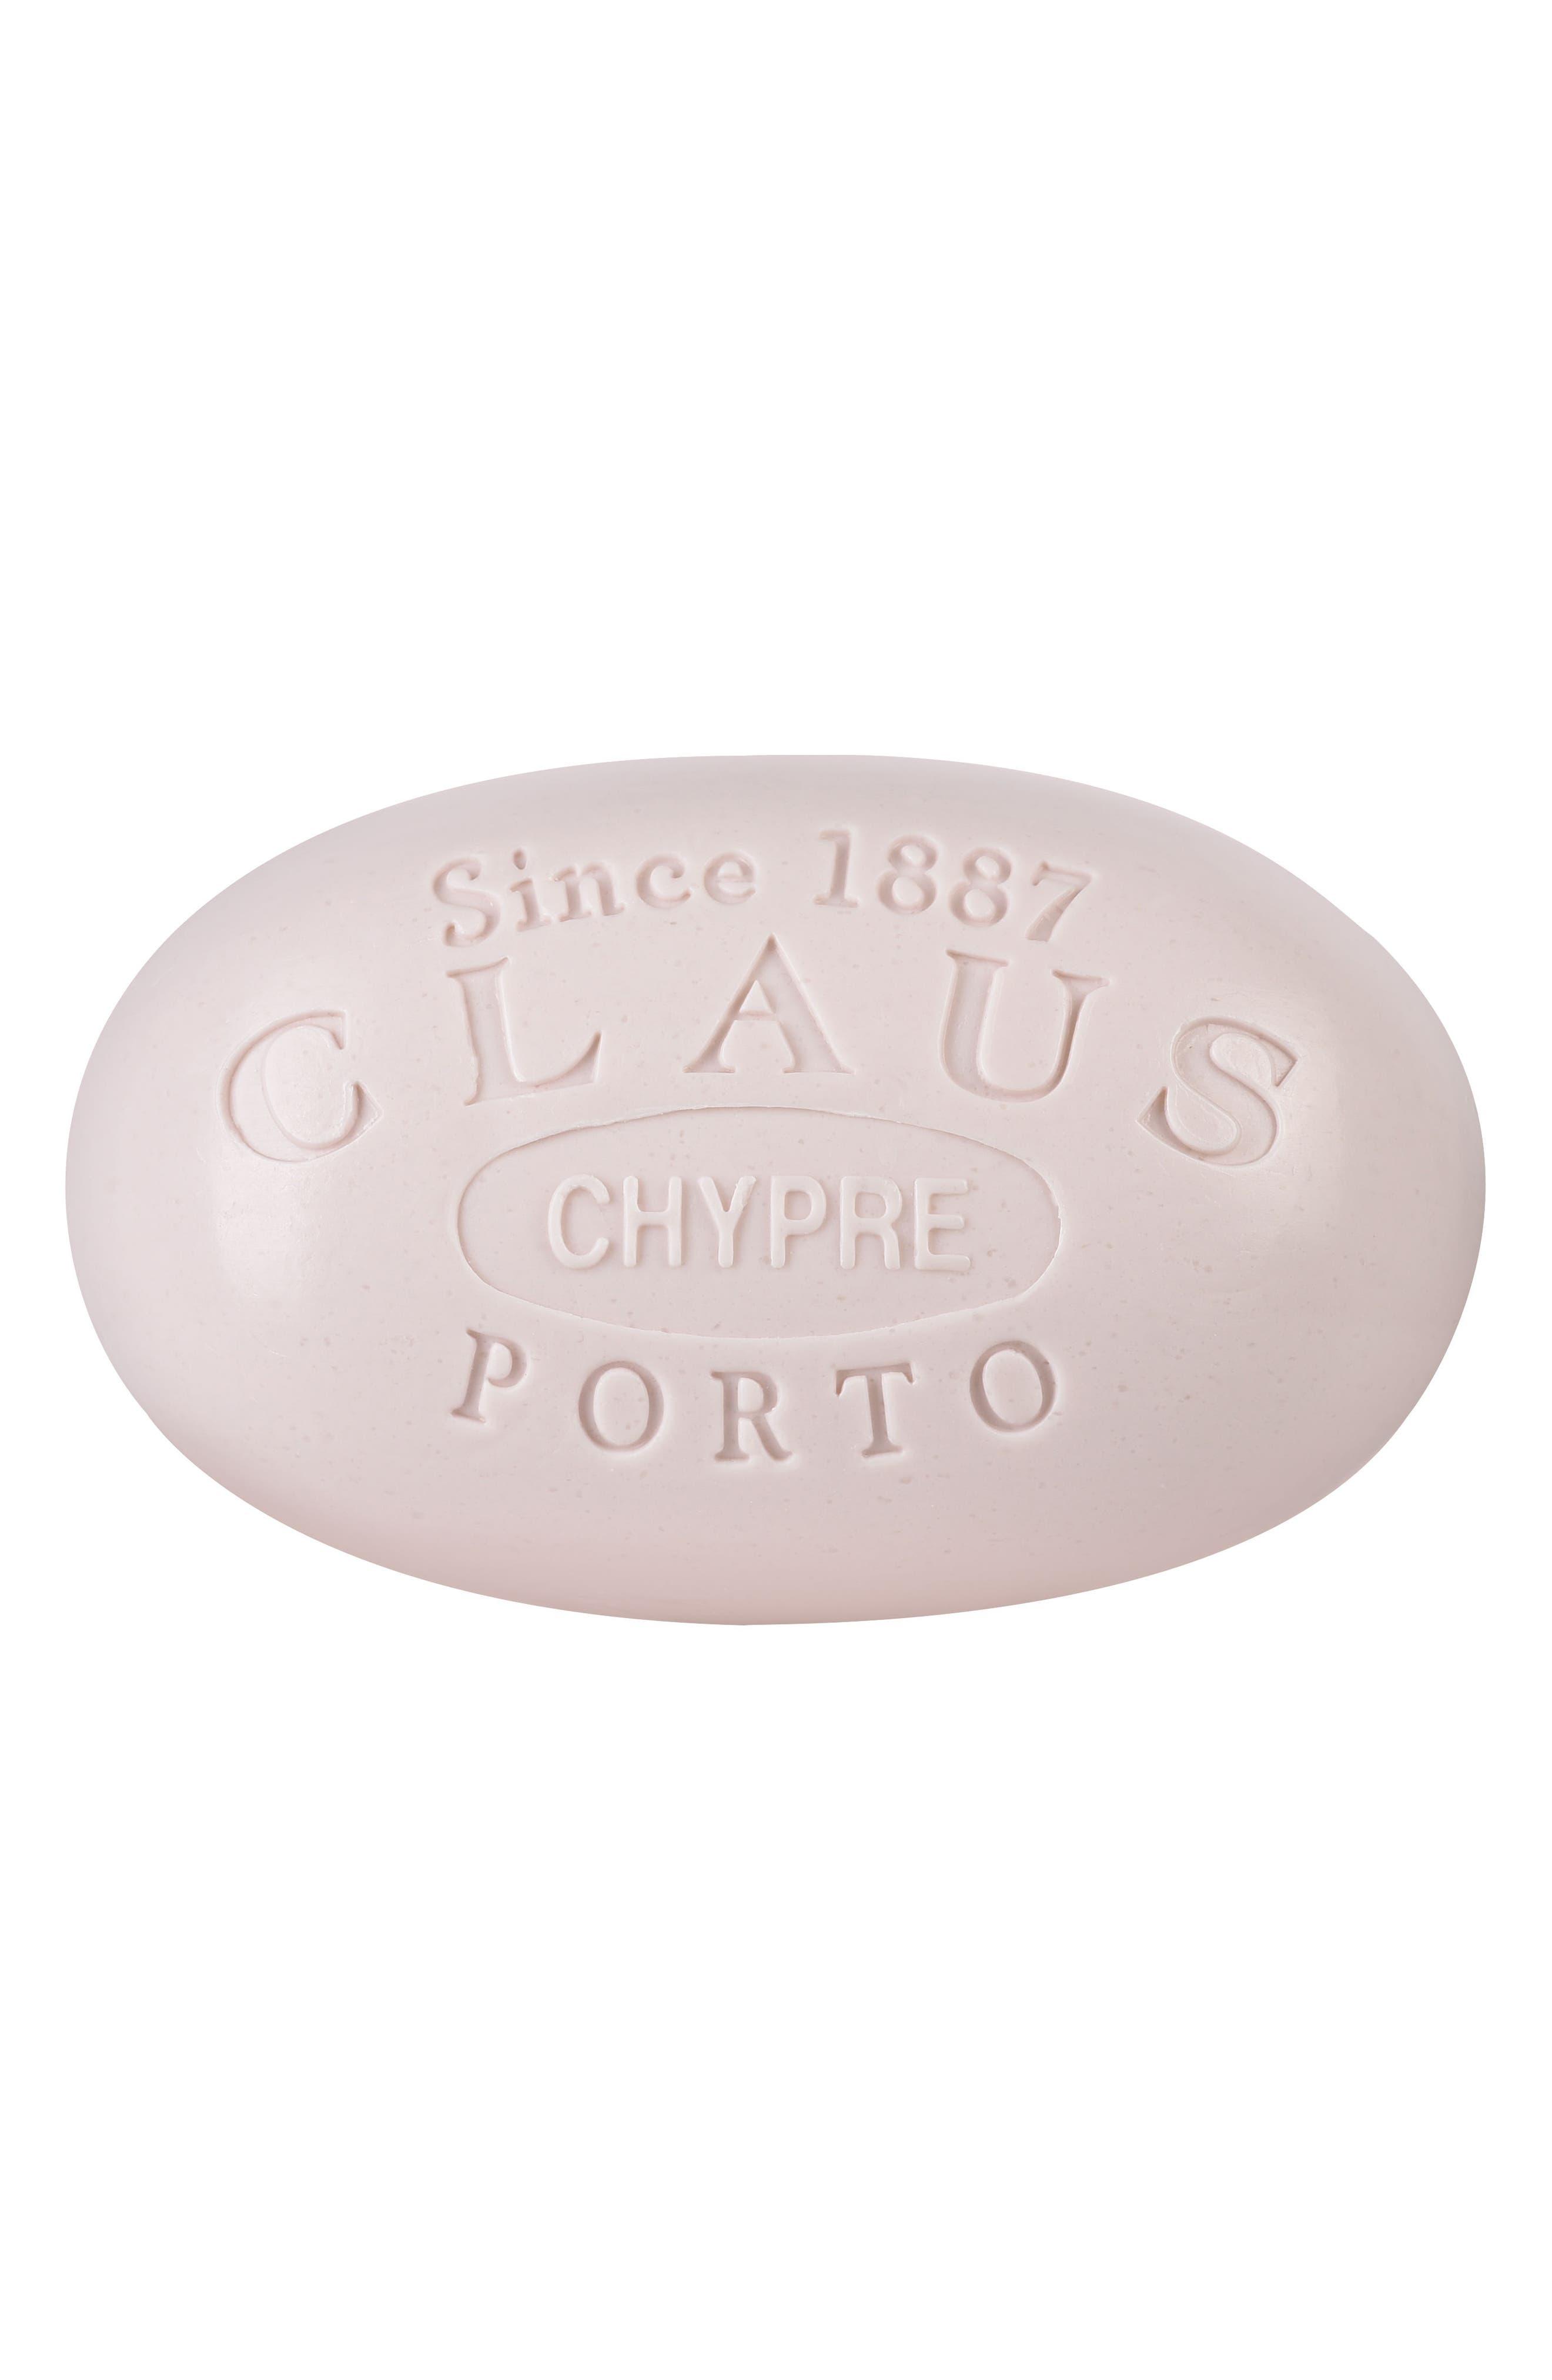 Main Image - Claus Porto Chypre Cedar Poinsettia Bath Soap